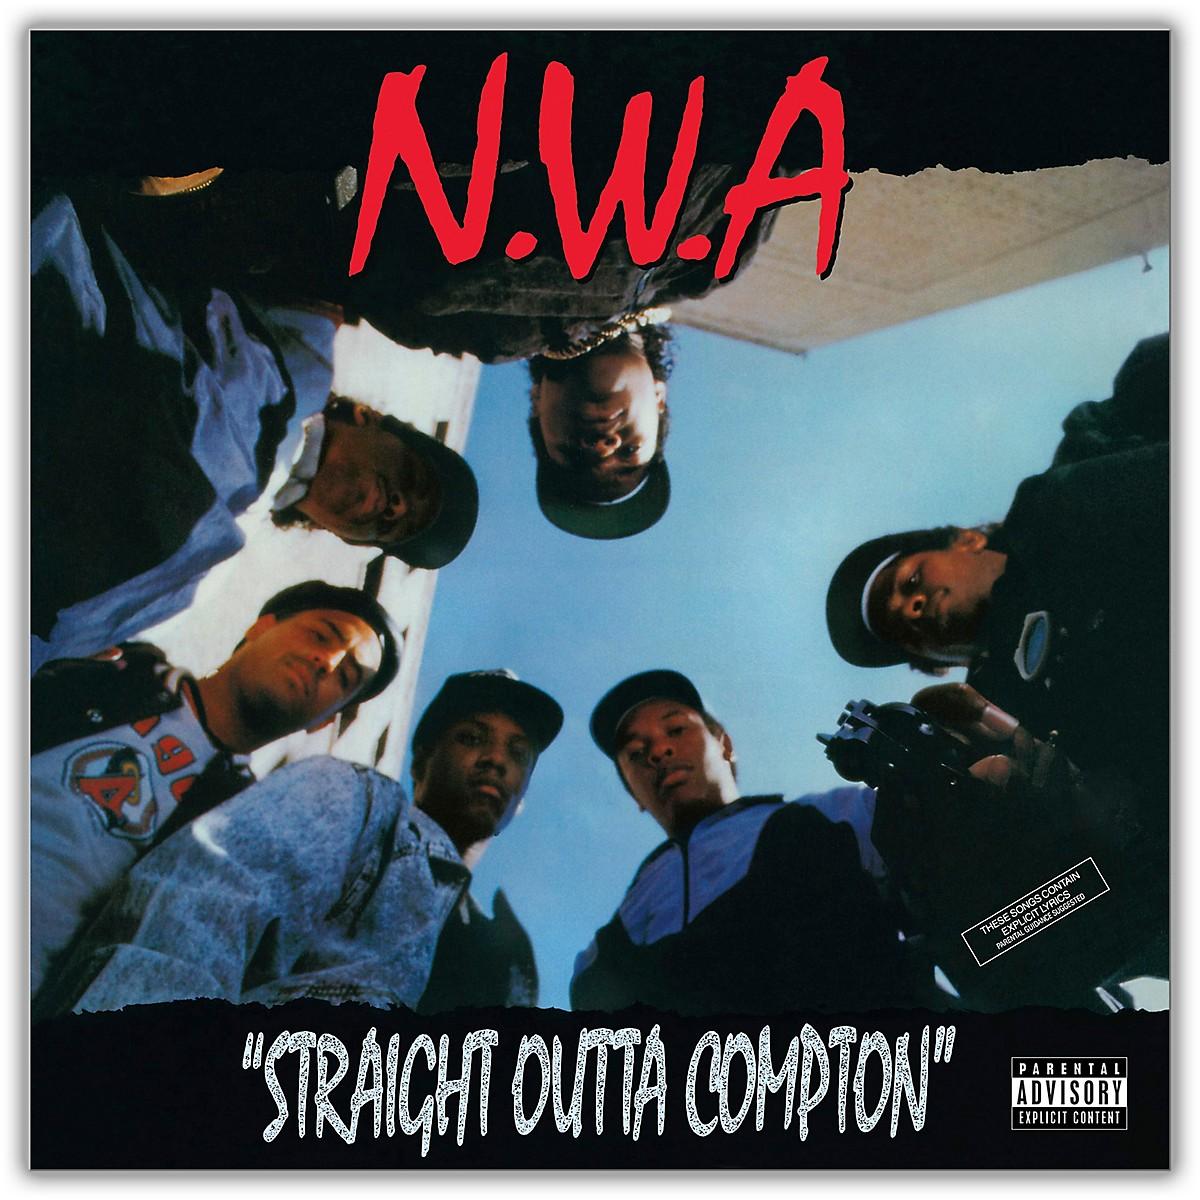 Universal Music Group N.W.A - Straight Outta Compton (25th Anniversary) Vinyl 2LP